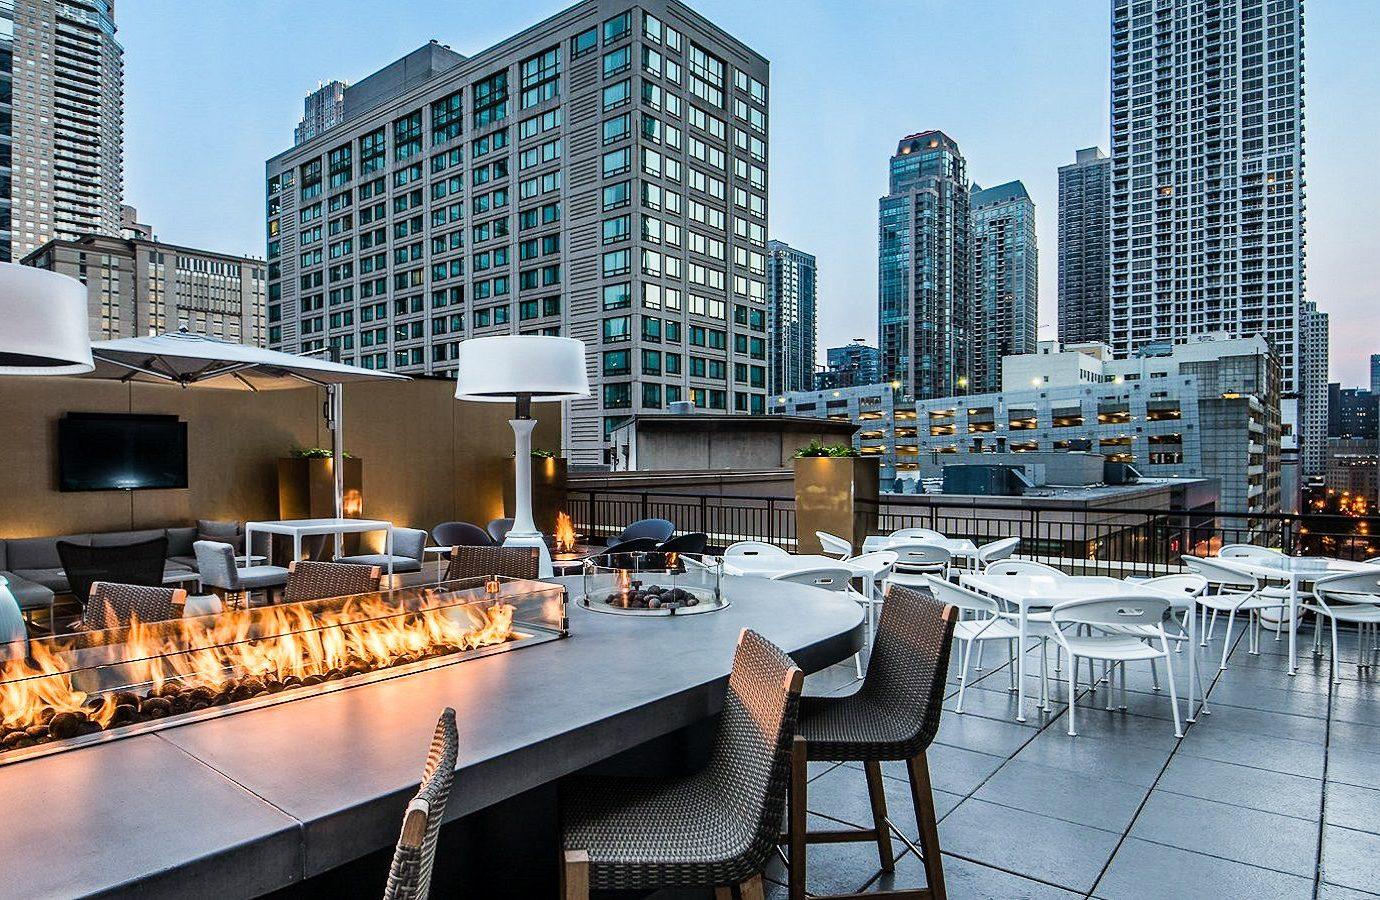 Food + Drink outdoor mixed use City Downtown condominium real estate metropolitan area apartment building metropolis roof hotel outdoor structure water skyscraper